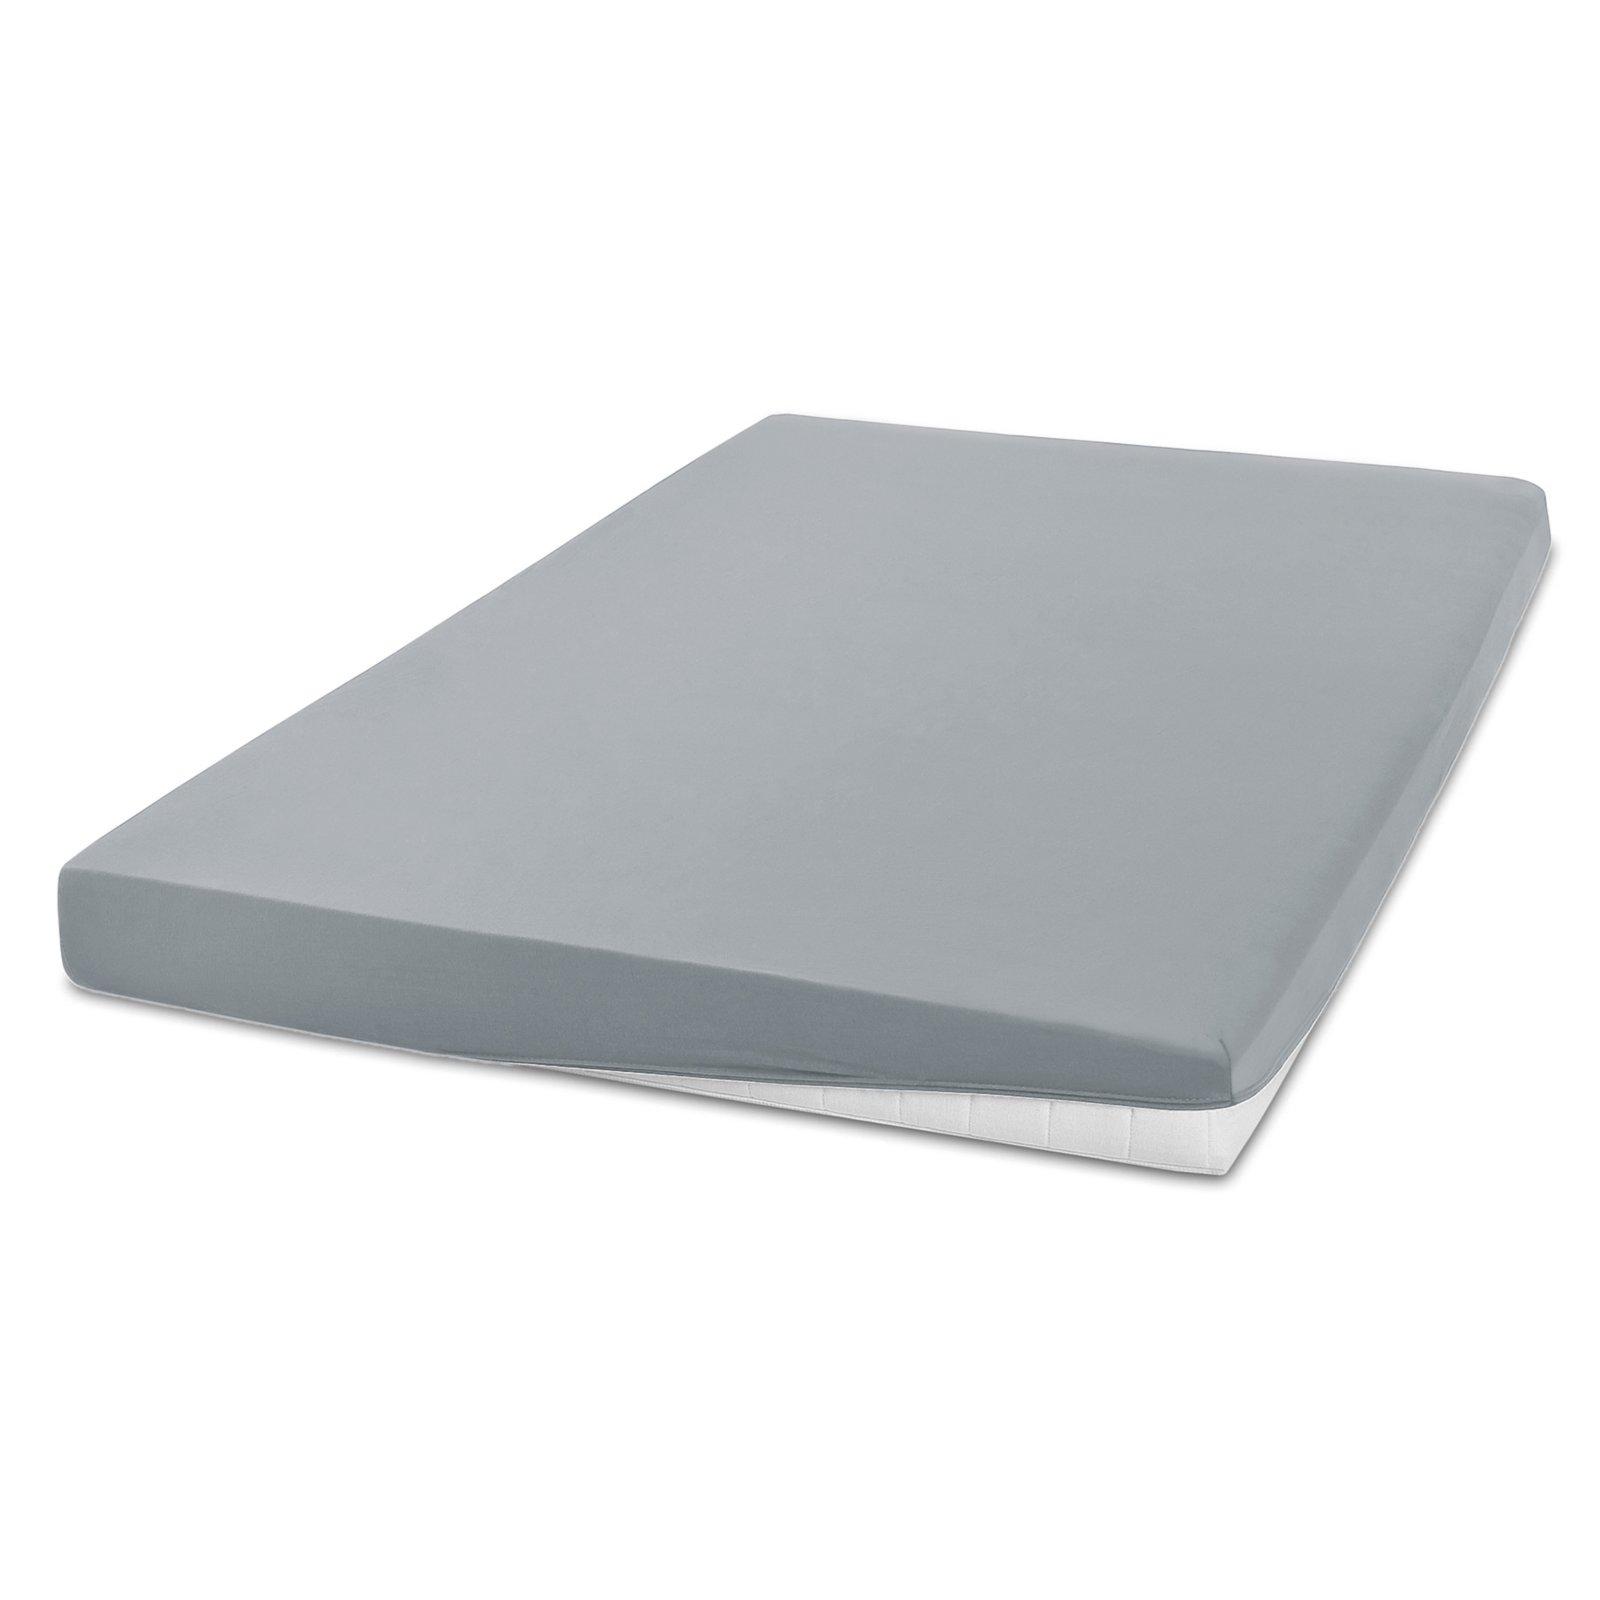 elastic jersey spannbettlaken exclusiv silber 90x200 cm bettlaken bettw sche bettlaken. Black Bedroom Furniture Sets. Home Design Ideas